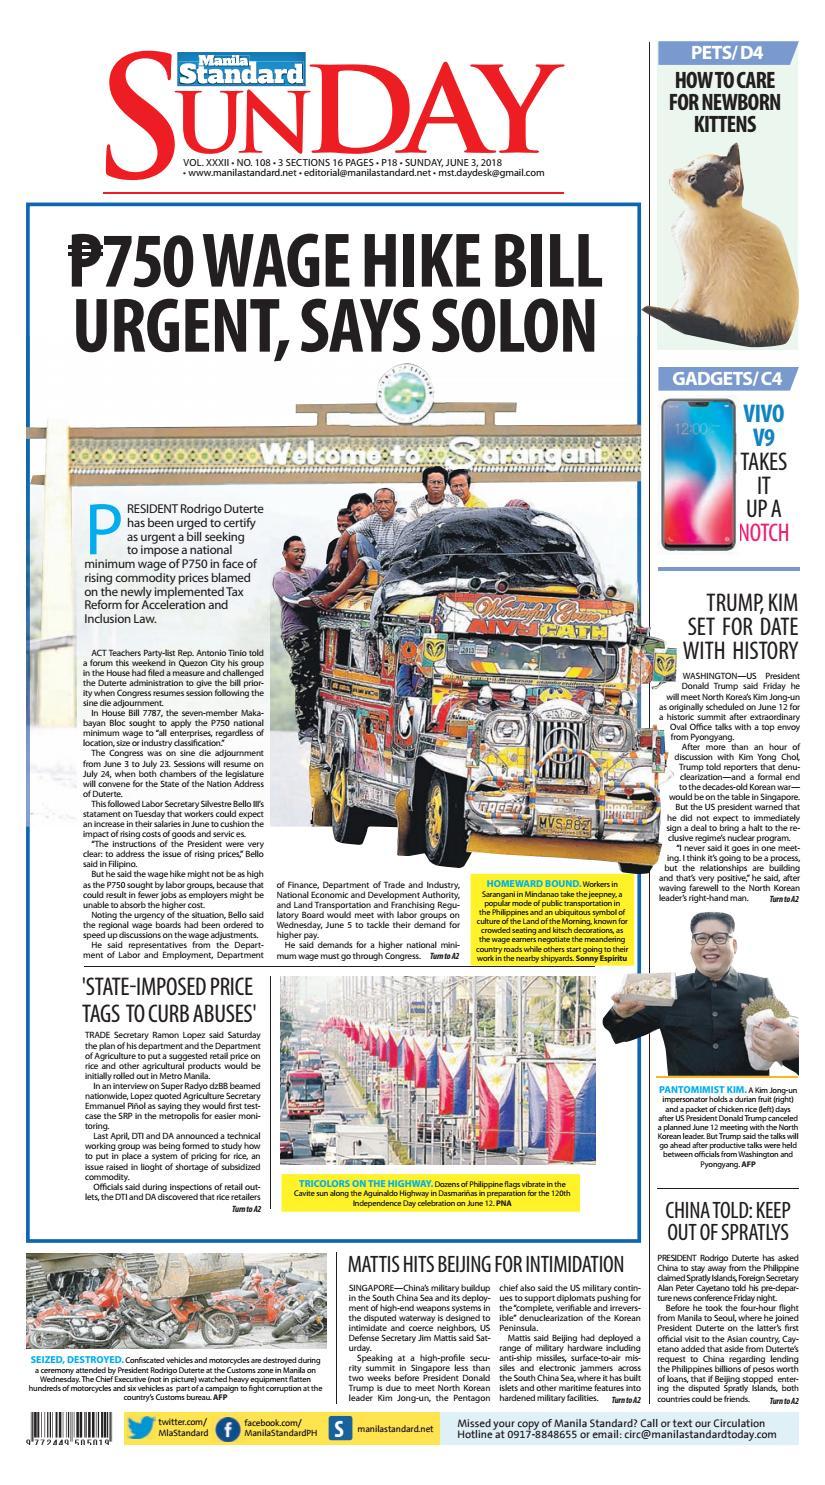 Manila Standard - 2018 June 3 - Sunday by Manila Standard